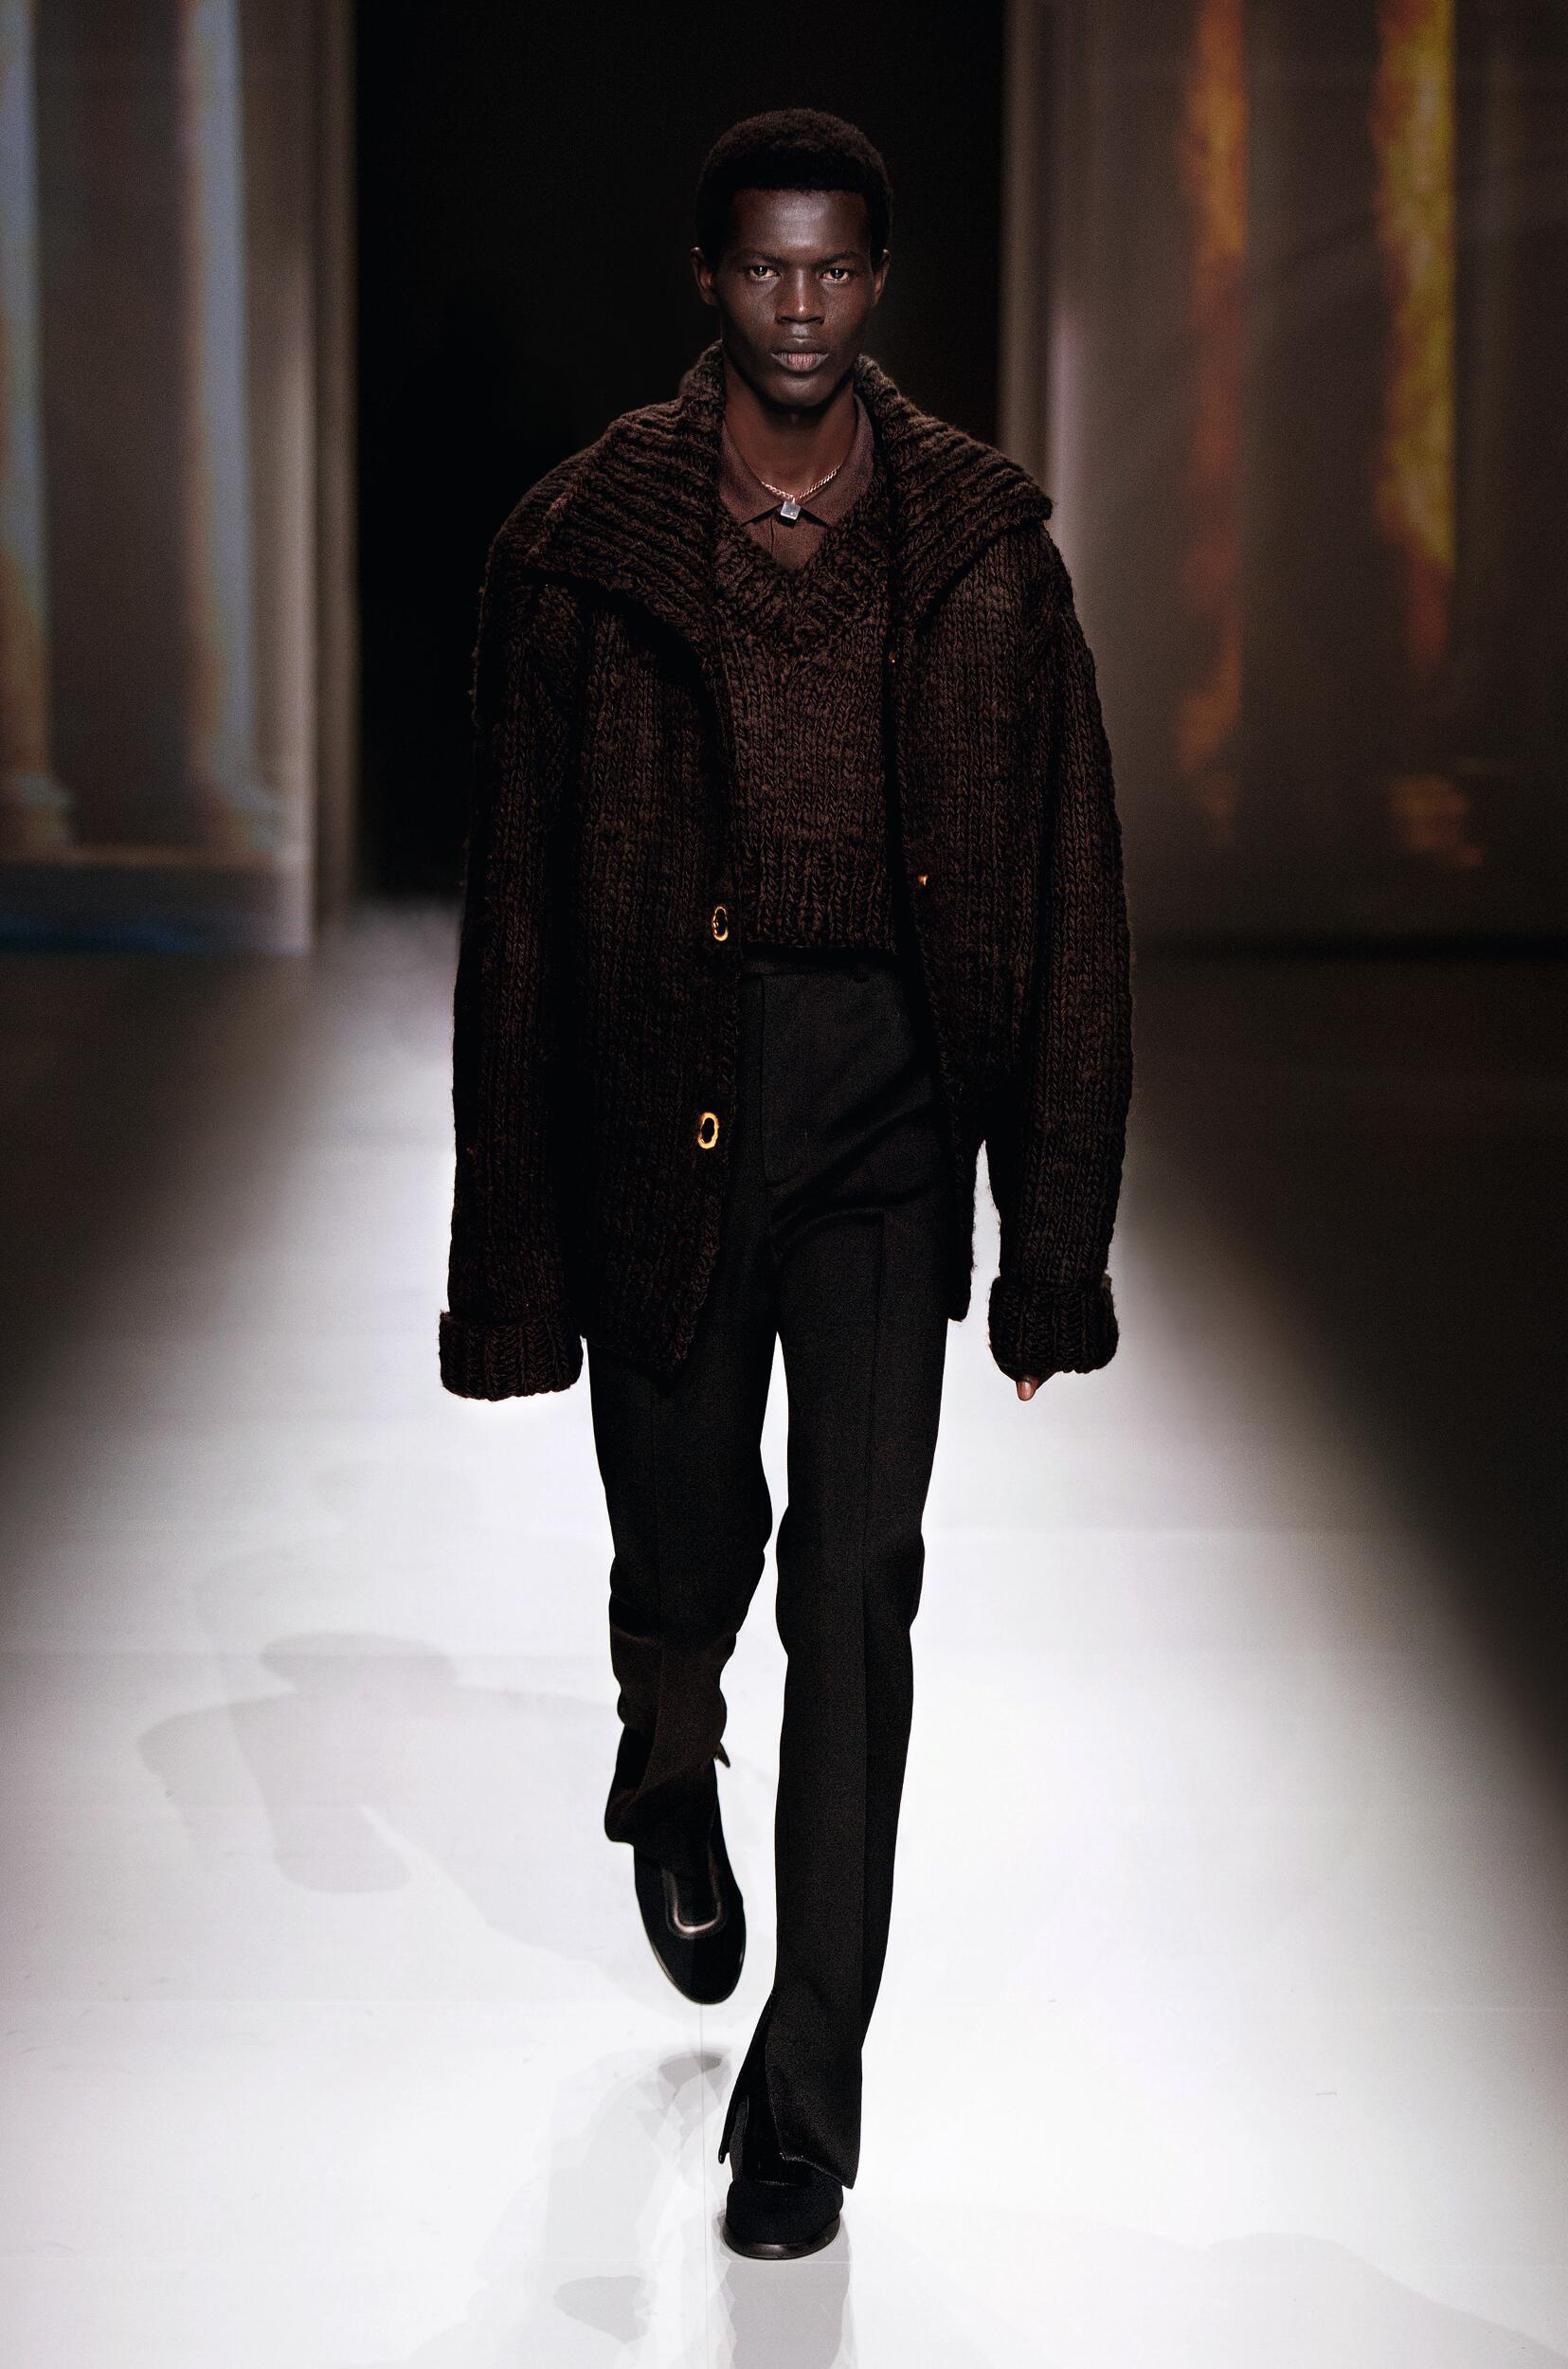 Fall Winter Fashion Trends 2020 Bottega Veneta